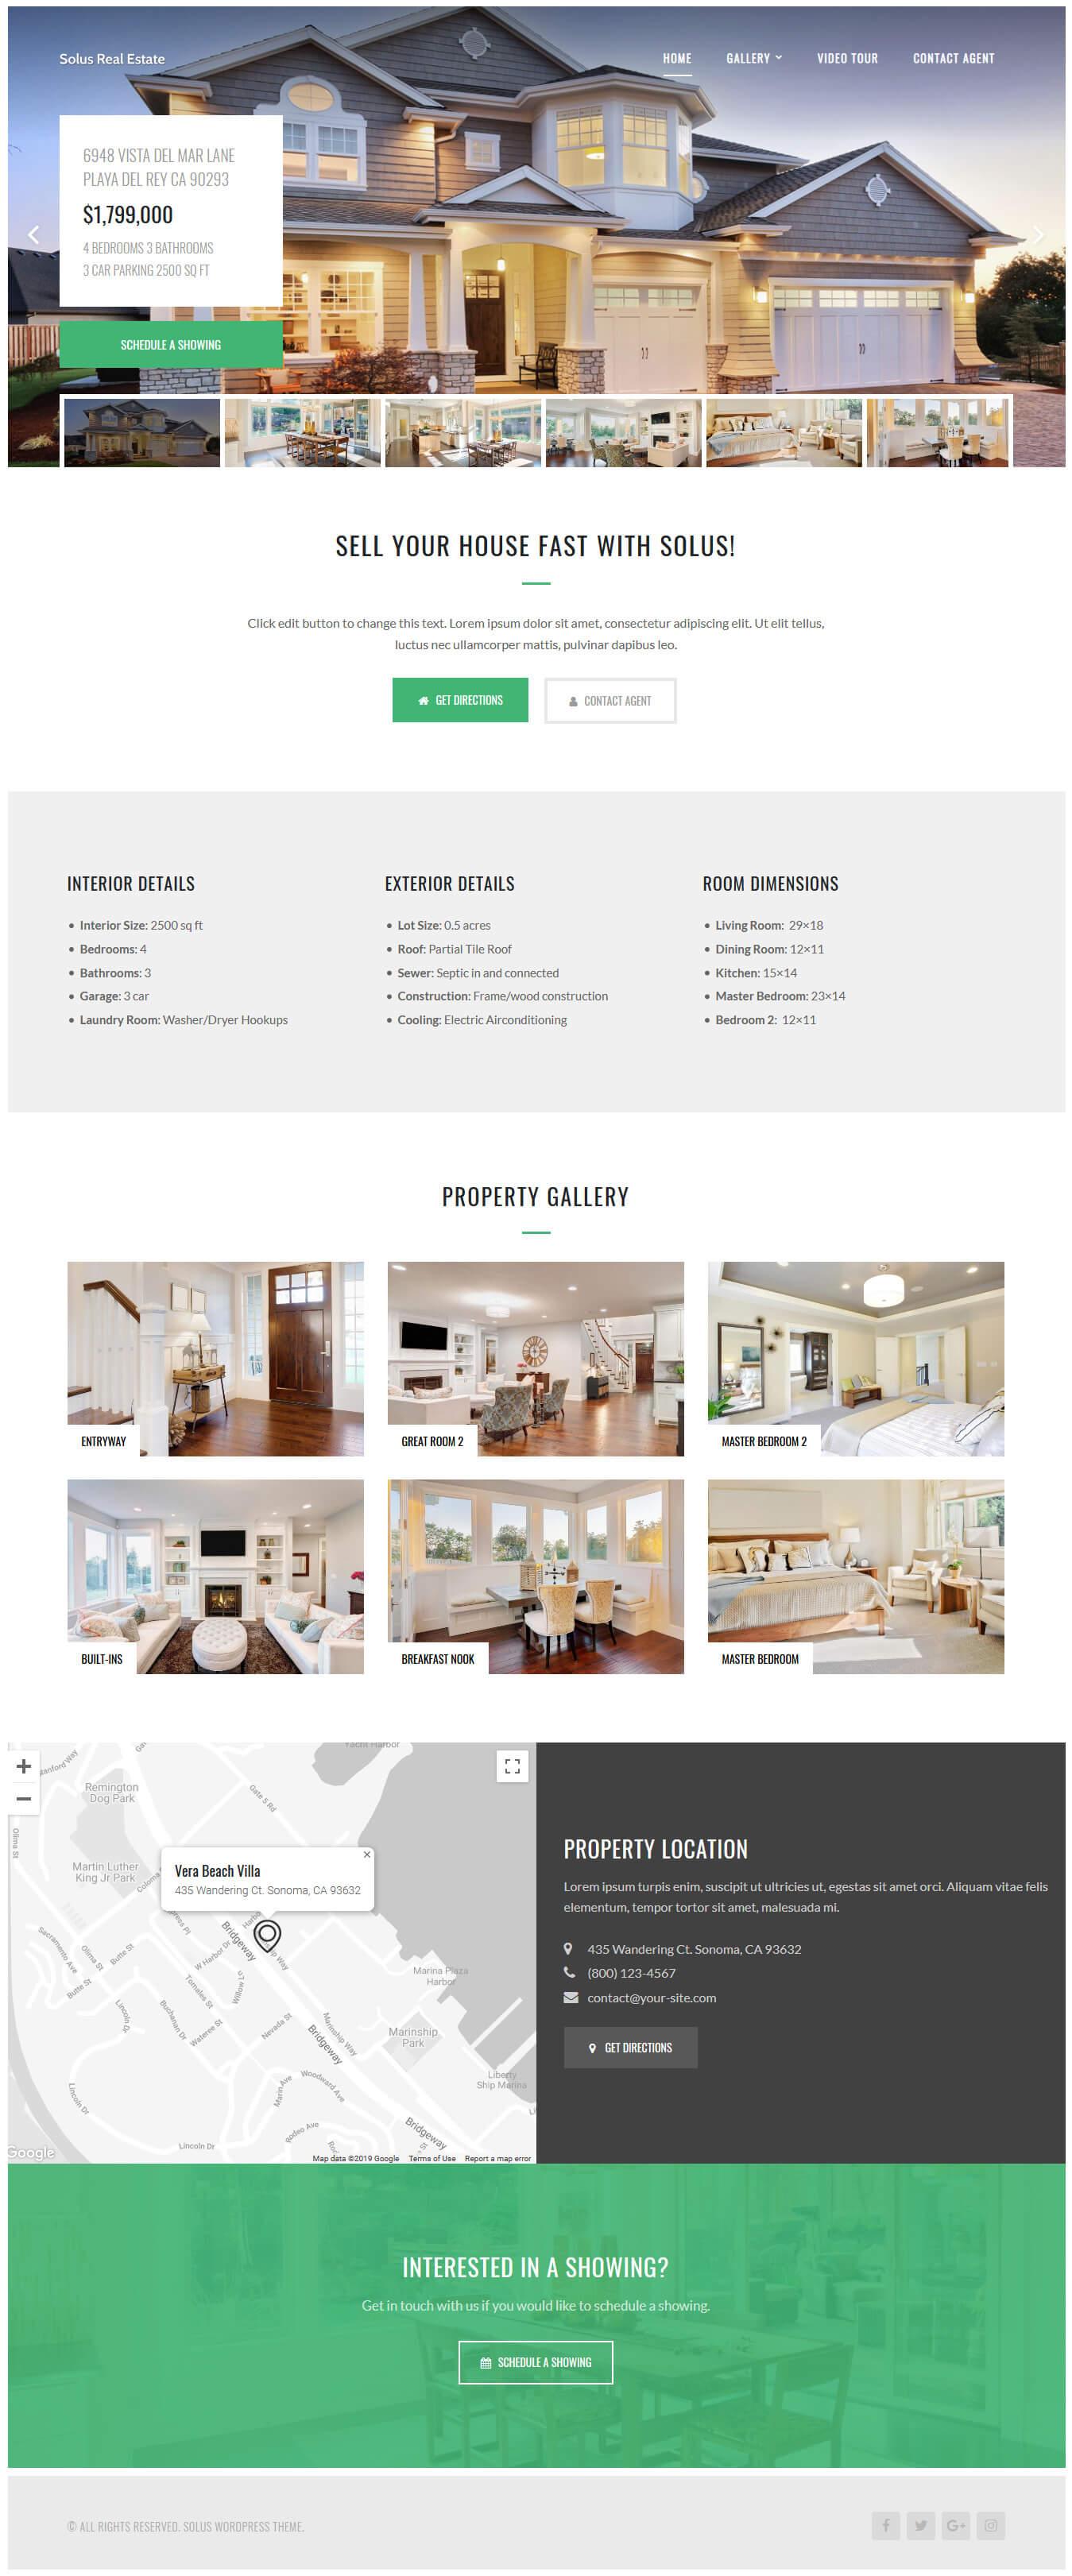 solus best premium home rental property wordpress theme - 10+ Best Premium Home Rental and Property WordPress Themes